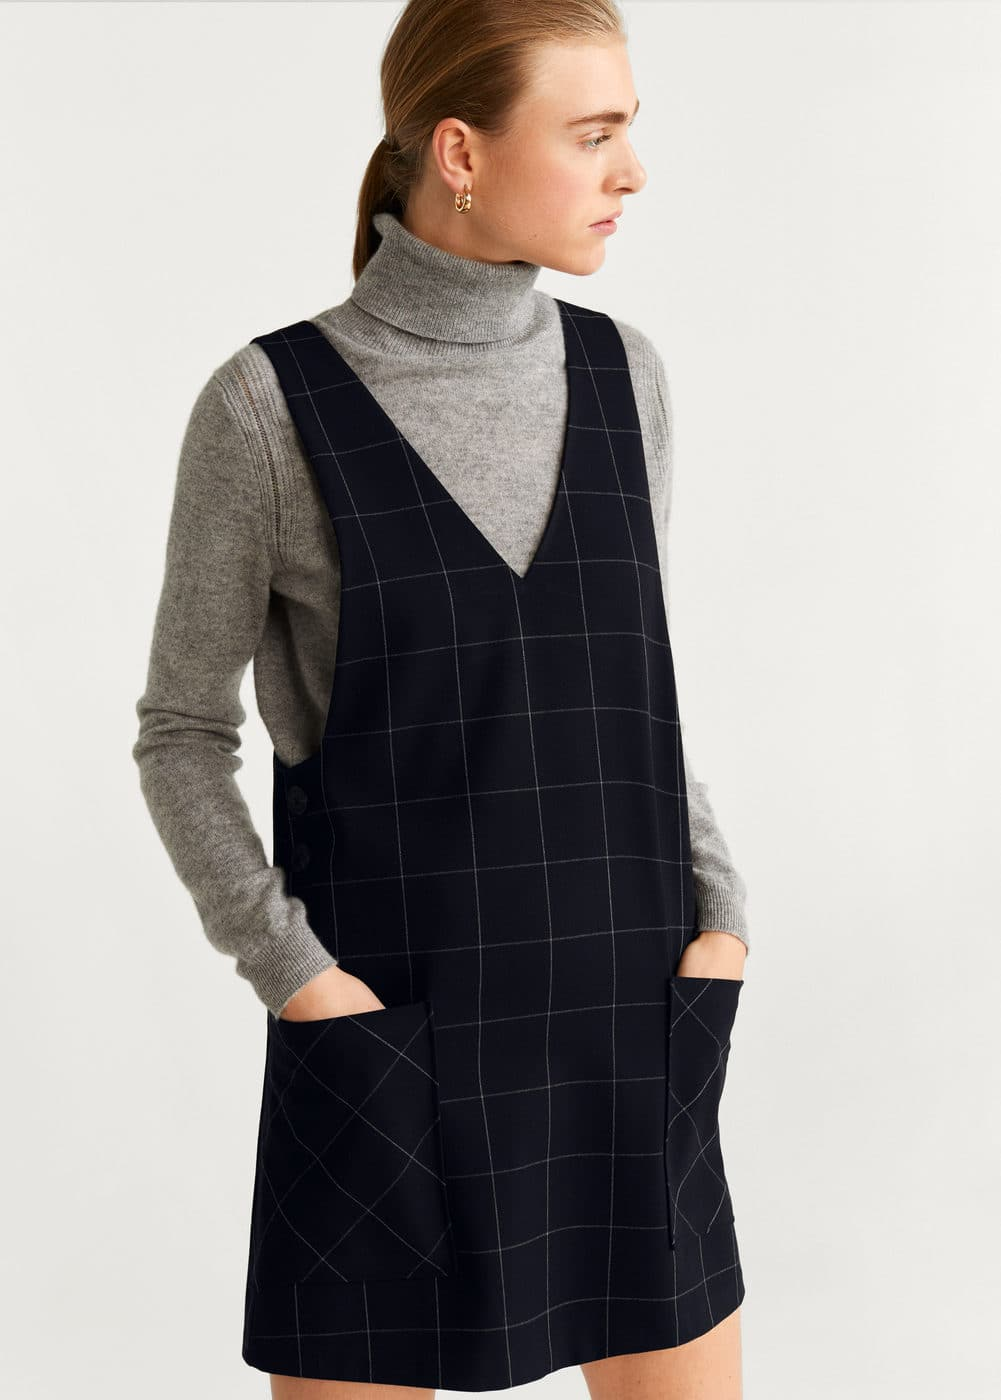 Two Pocket Check Dress by Mango